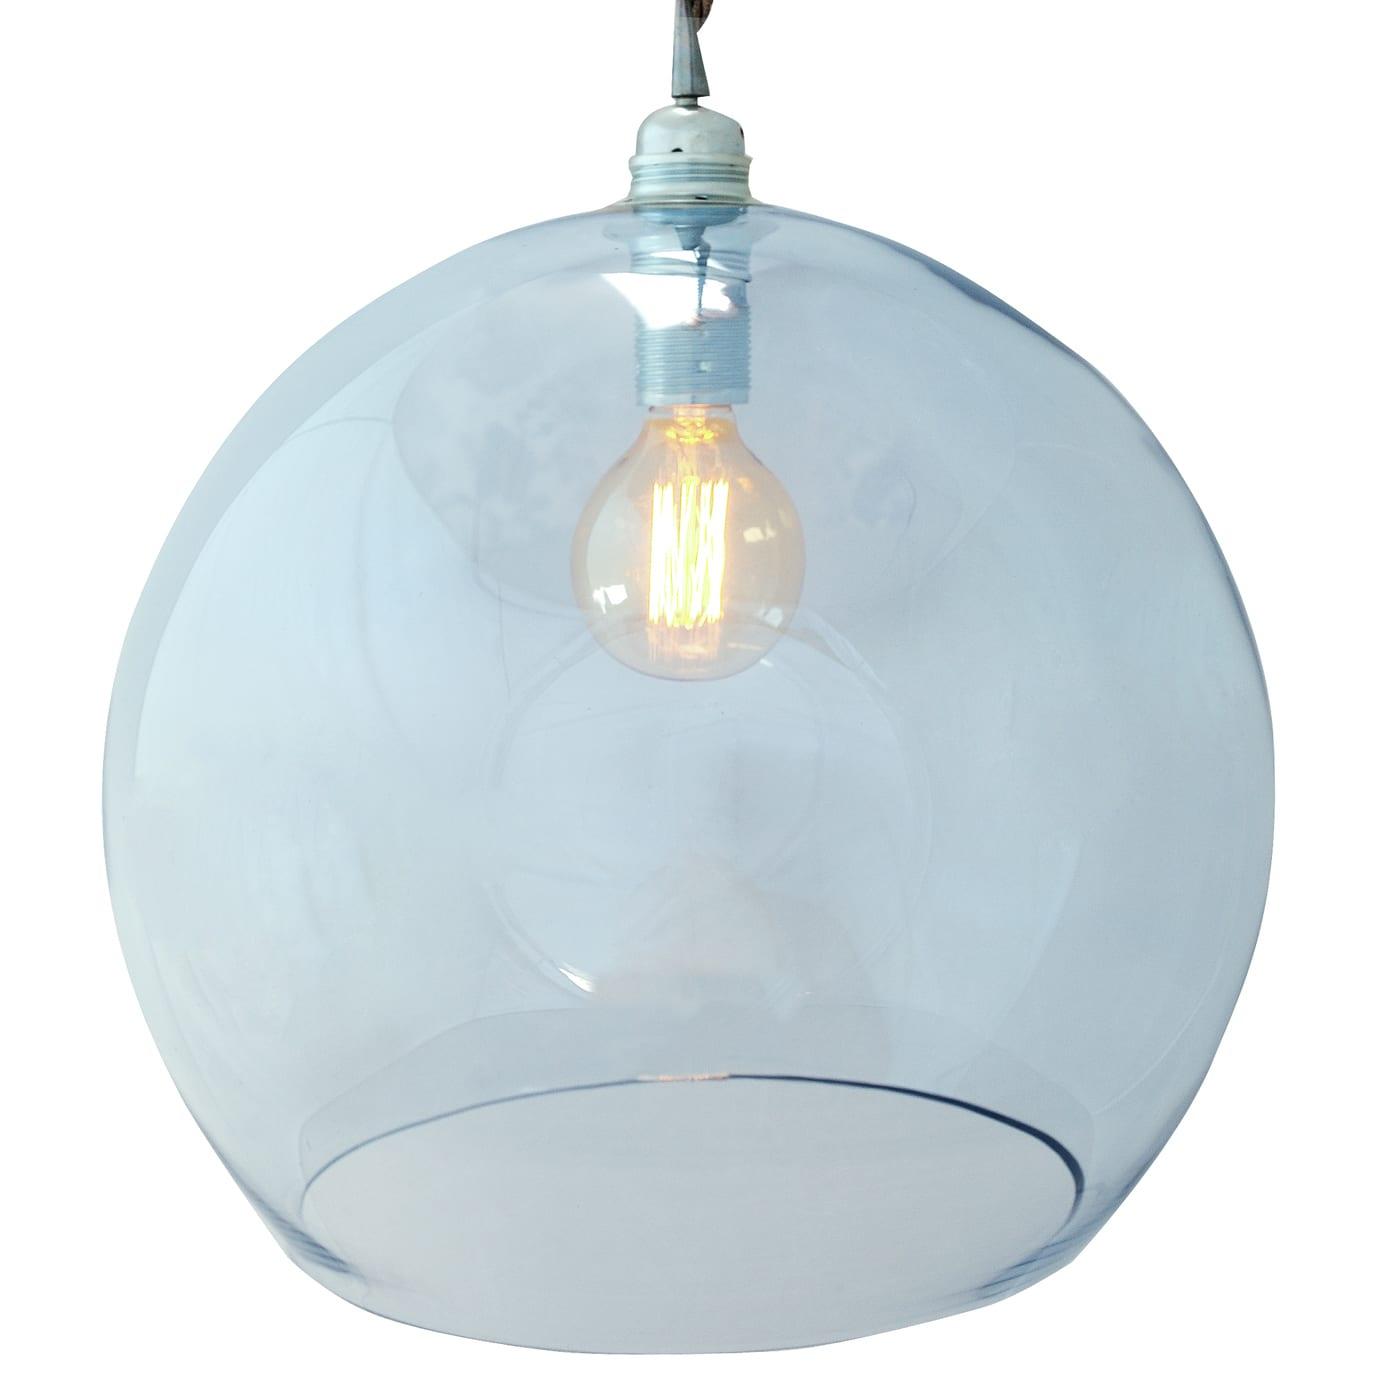 Rowan pendant lamp, topaz blue, 39cm 1